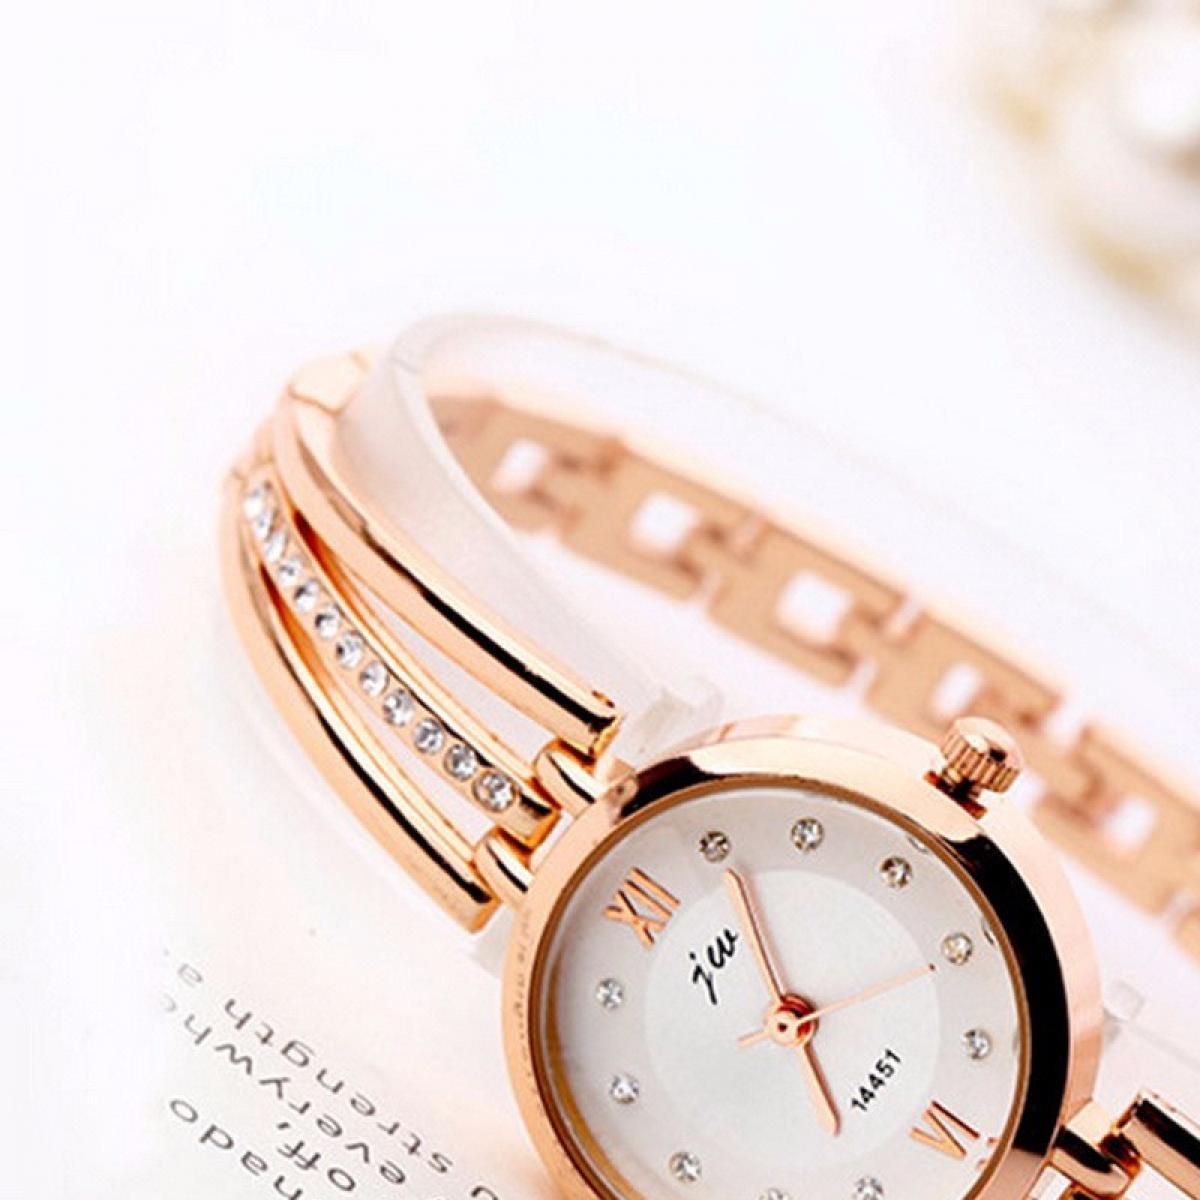 Ladies Stainless Steel Bracelet Watches Women Fashion Diamond Dial Quartz Analog Watch Female Clock Silver